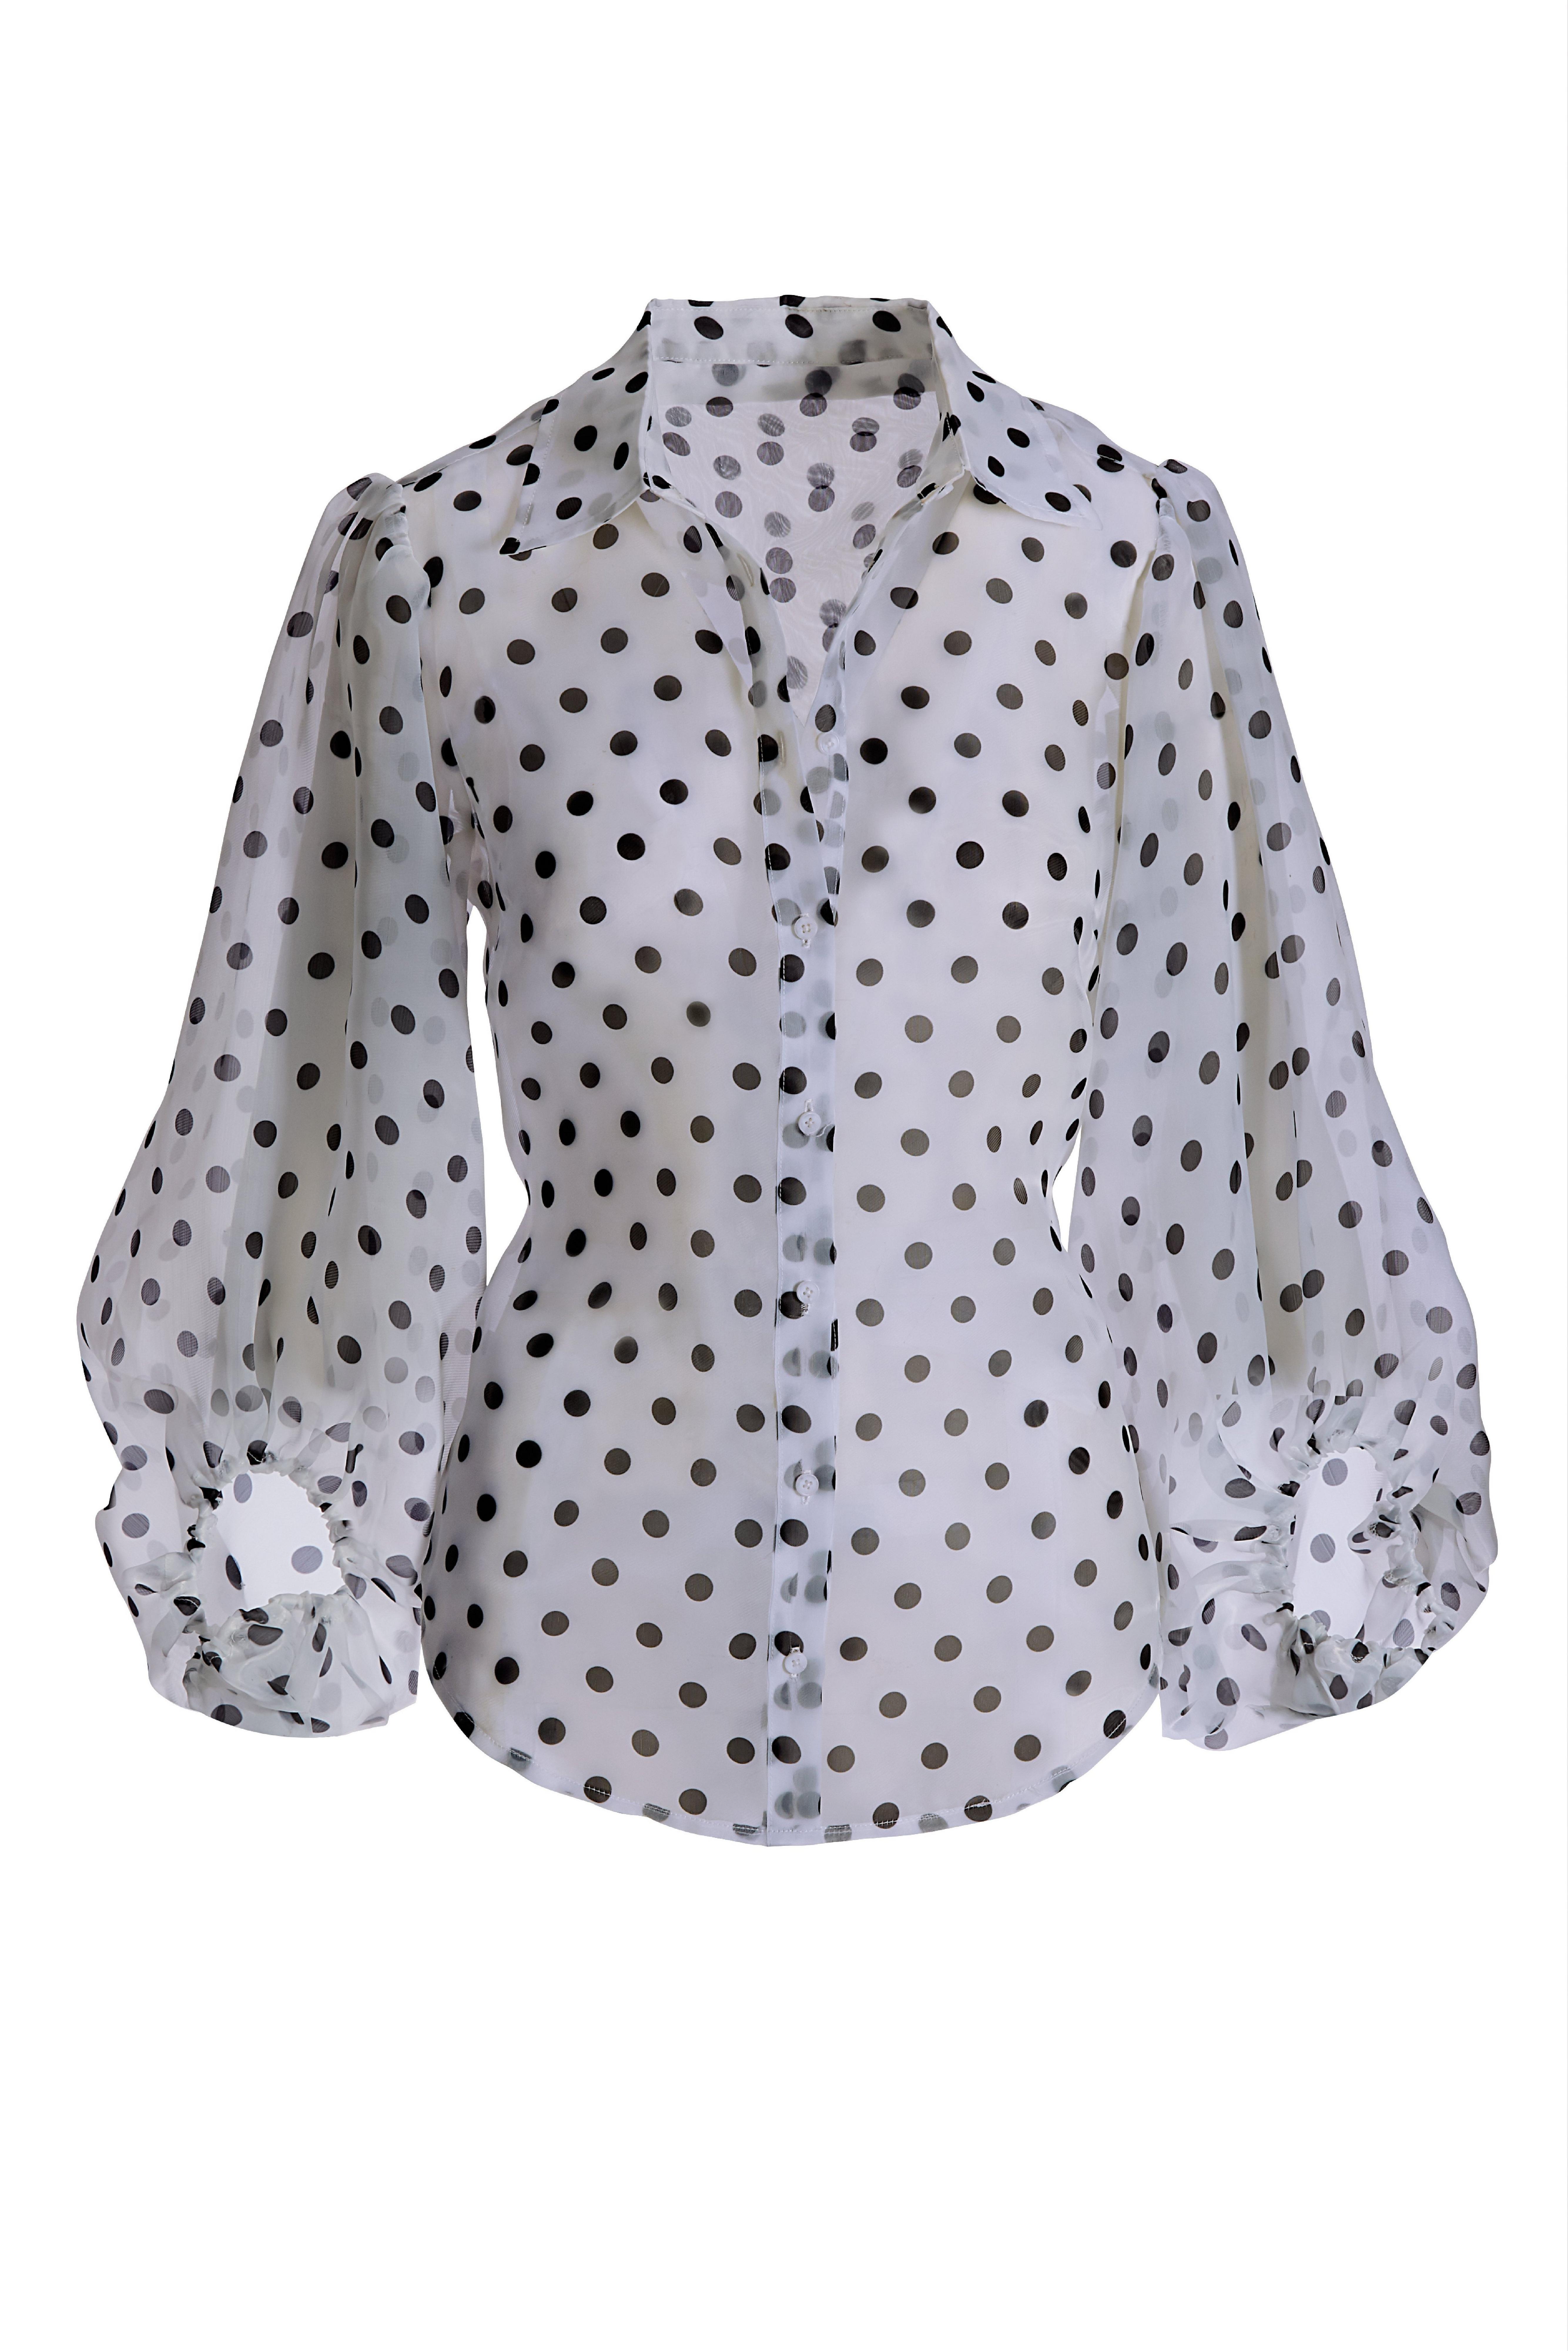 black and white polka dot long-sleeve top.